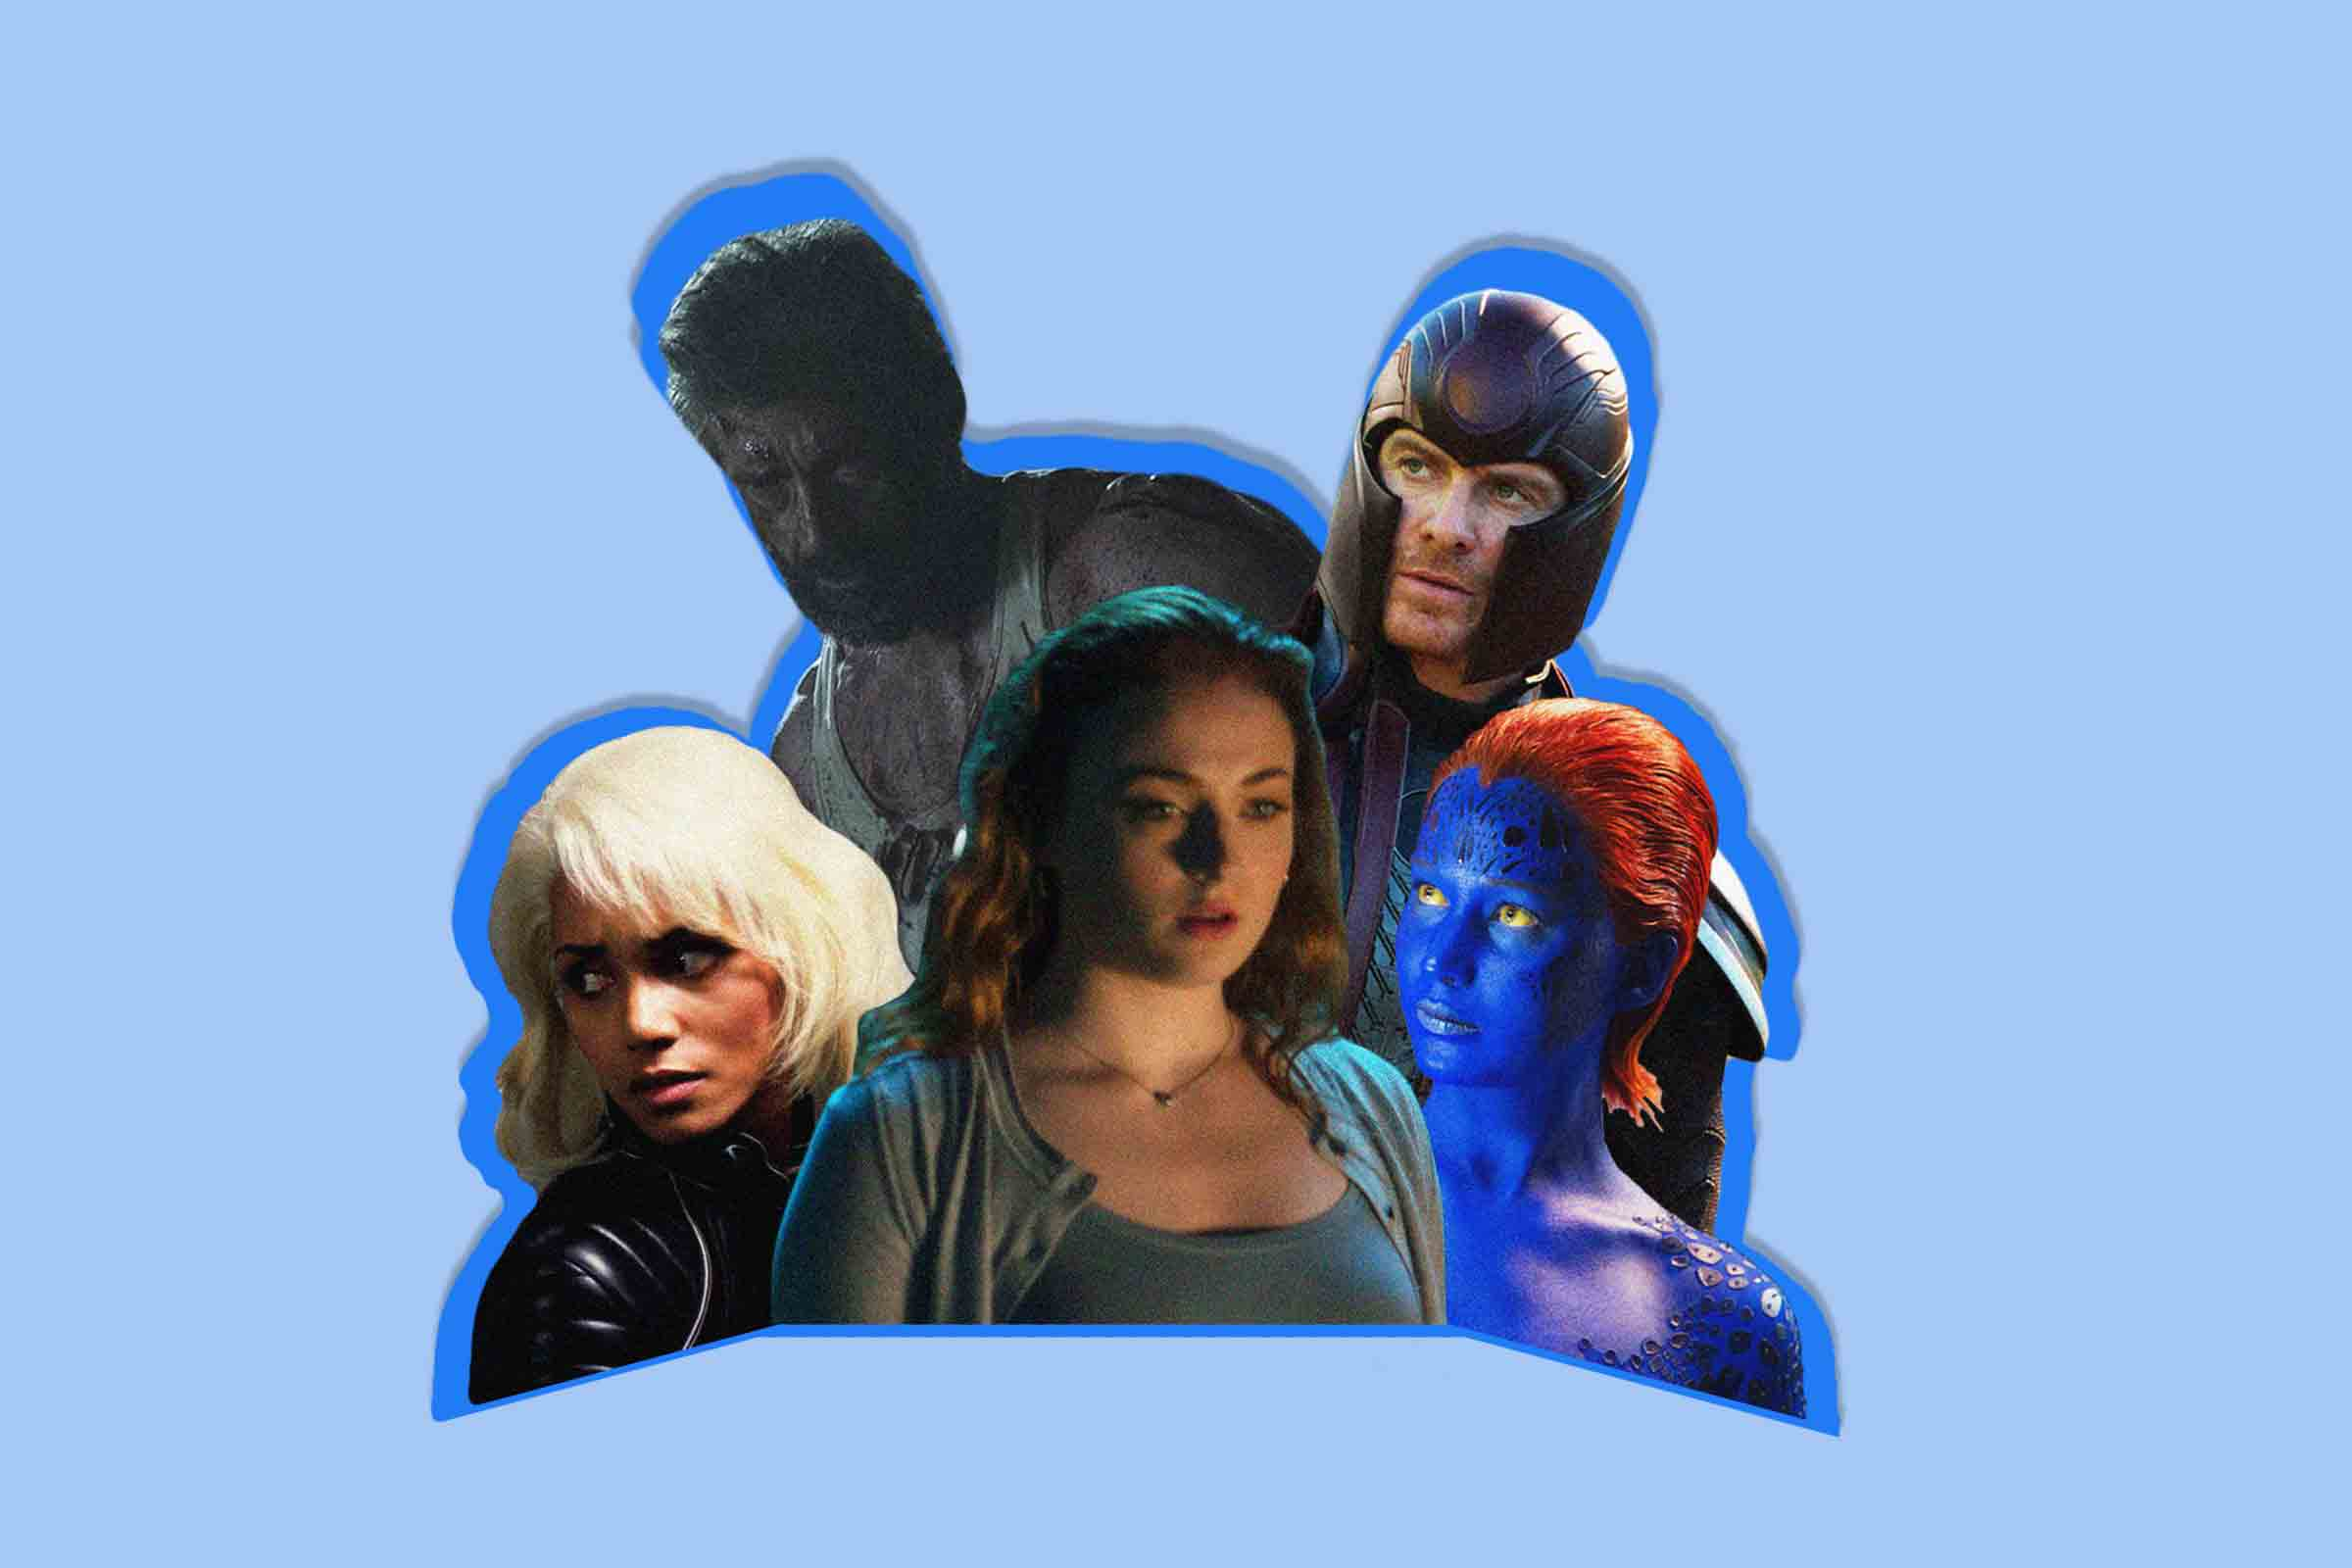 Logan Wolverine Fitting In X Men Timeline Plot Summaries Time Com